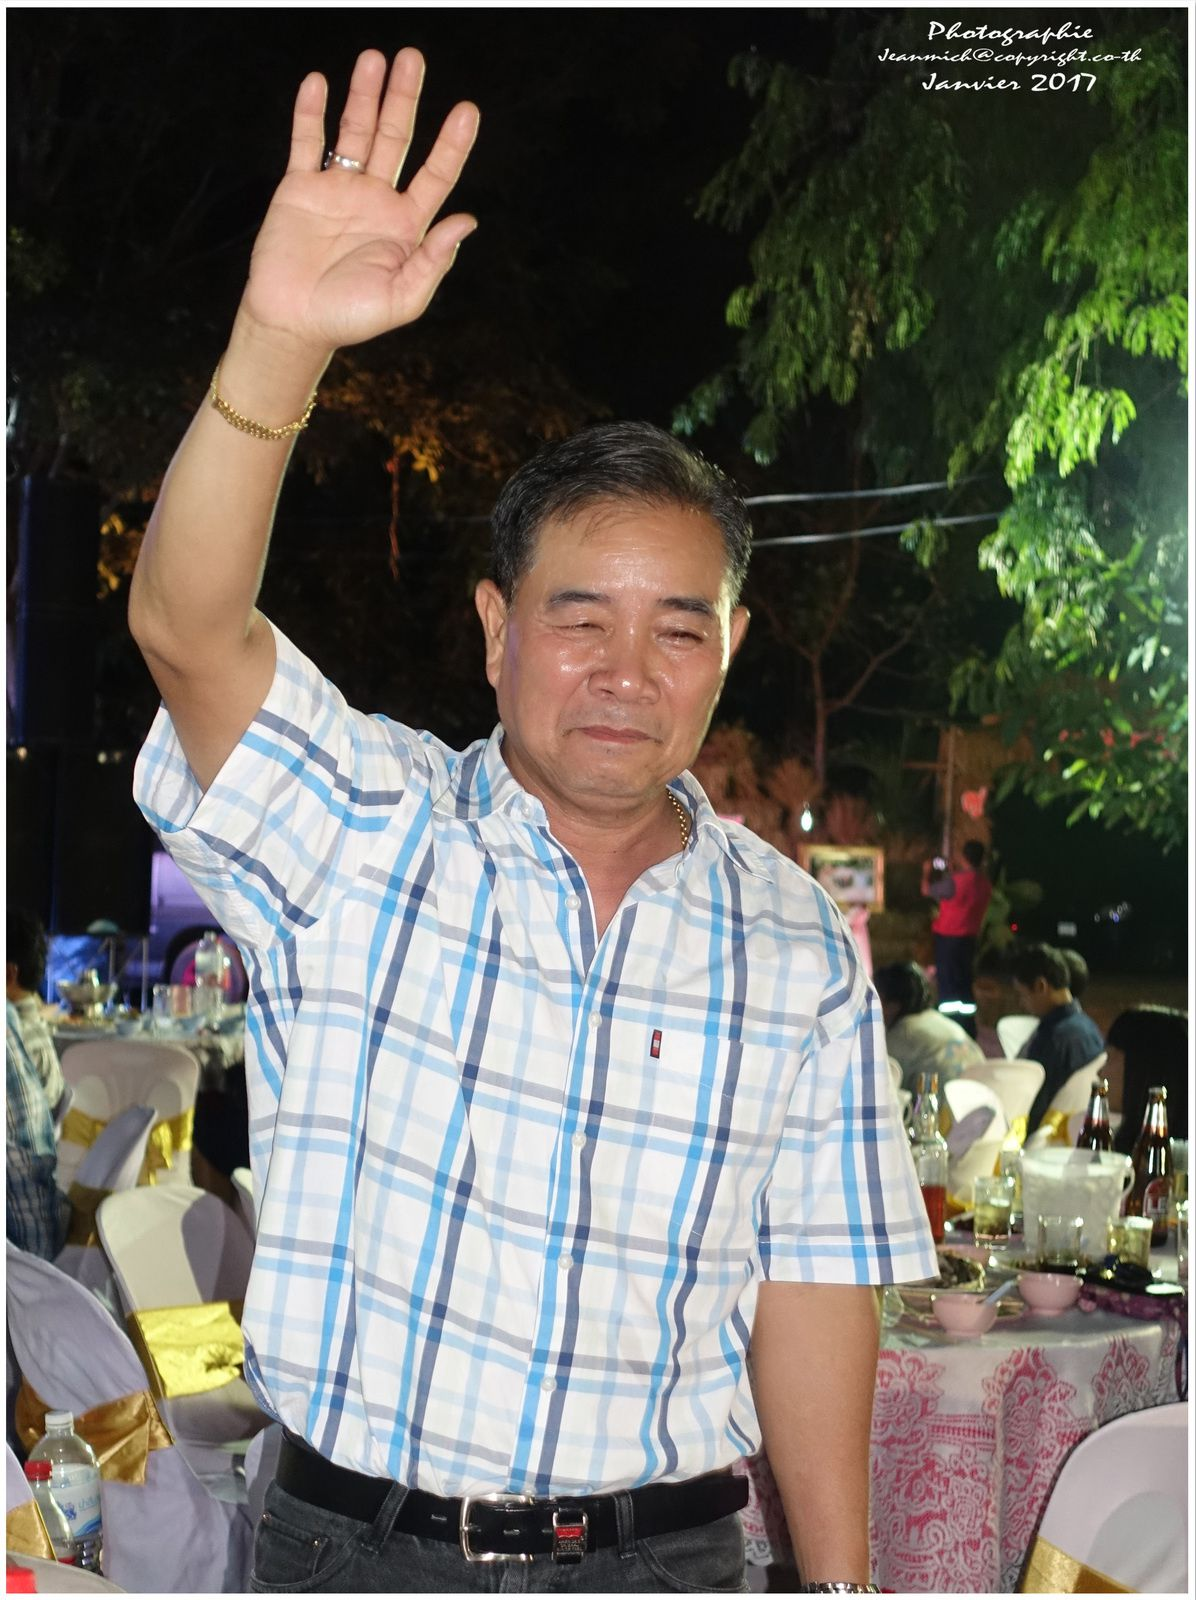 Mariage typique Thaï (2 janvier Ubonrat)